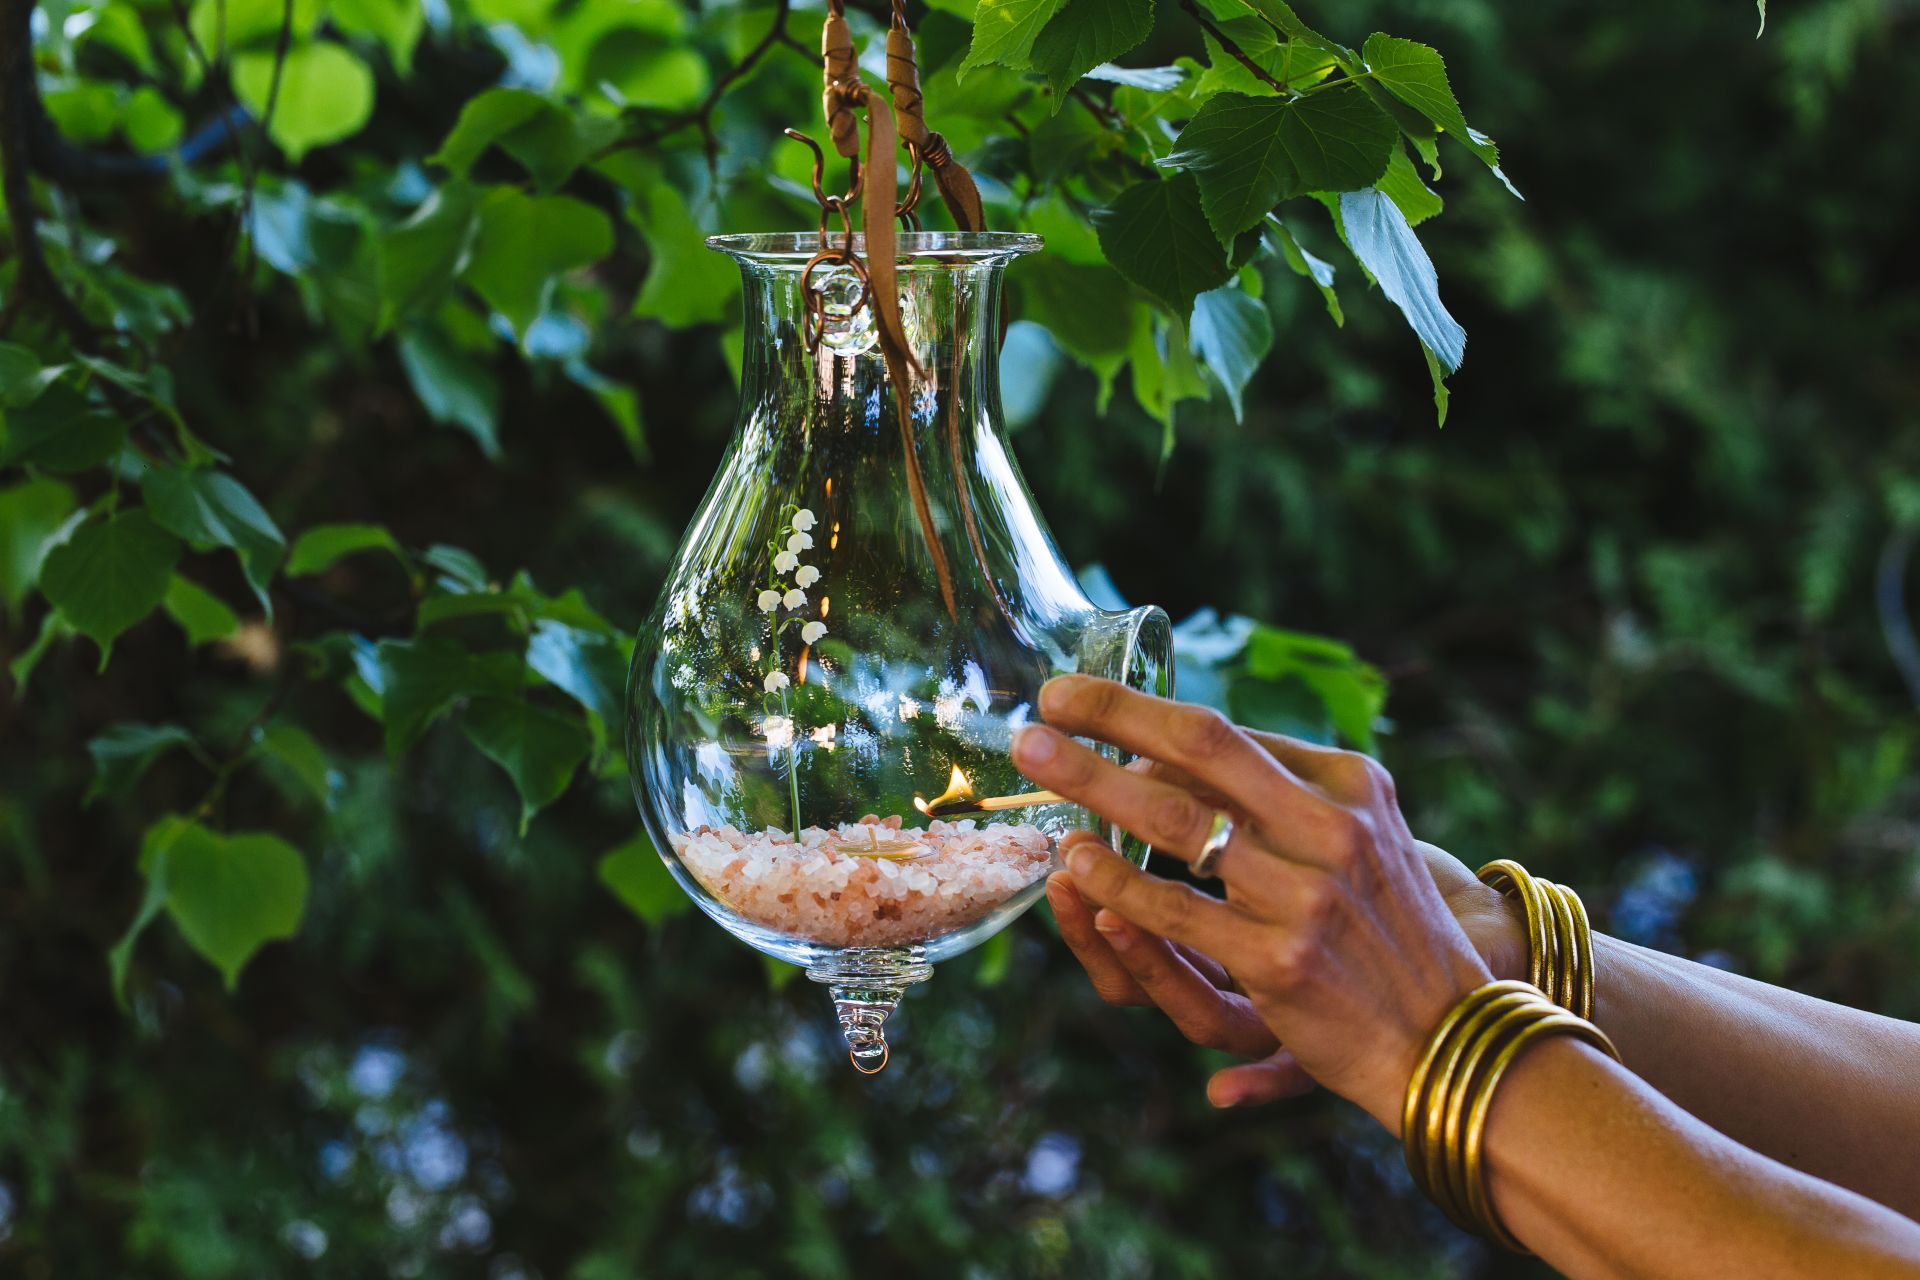 astrancia - accueil - lanterne - allumage